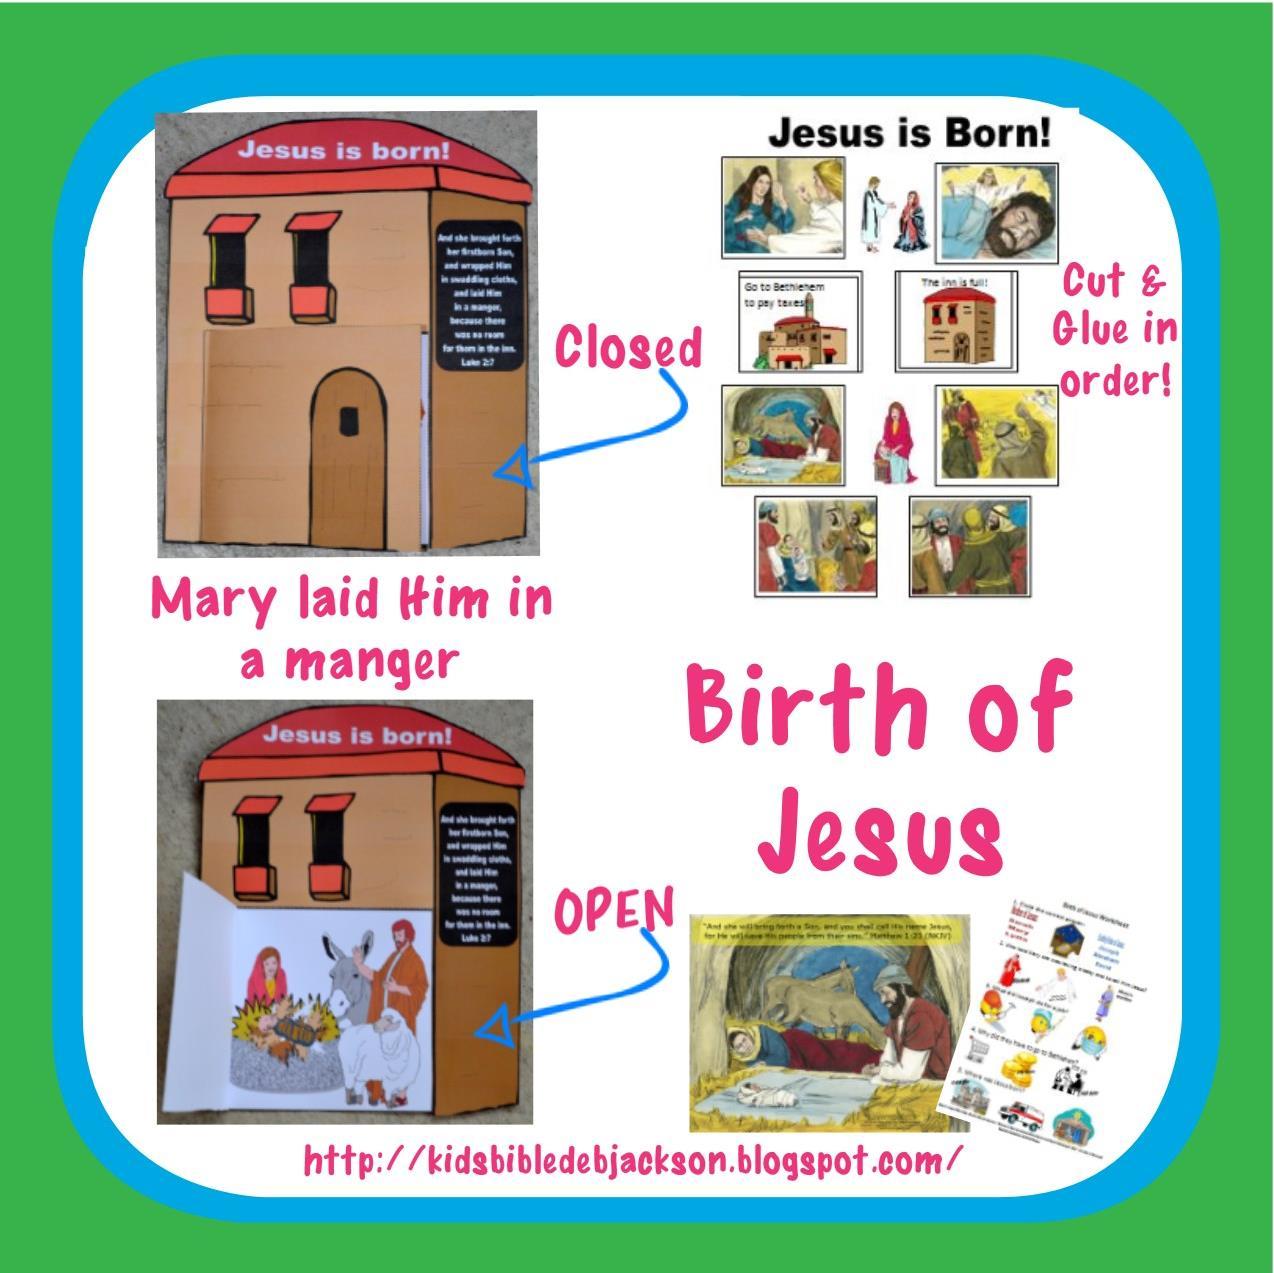 http://kidsbibledebjackson.blogspot.com/2014/06/birth-of-jesus.html